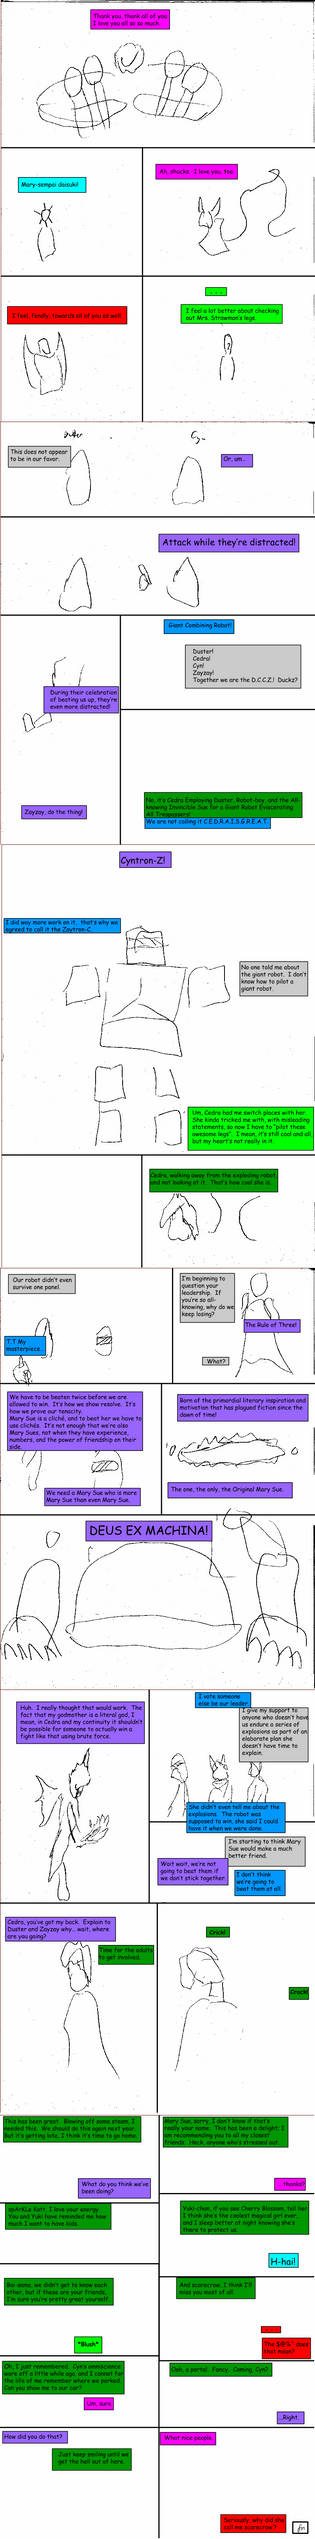 2018-02 Sue Me OCT Round 2 Page 7~12 by JJoseph